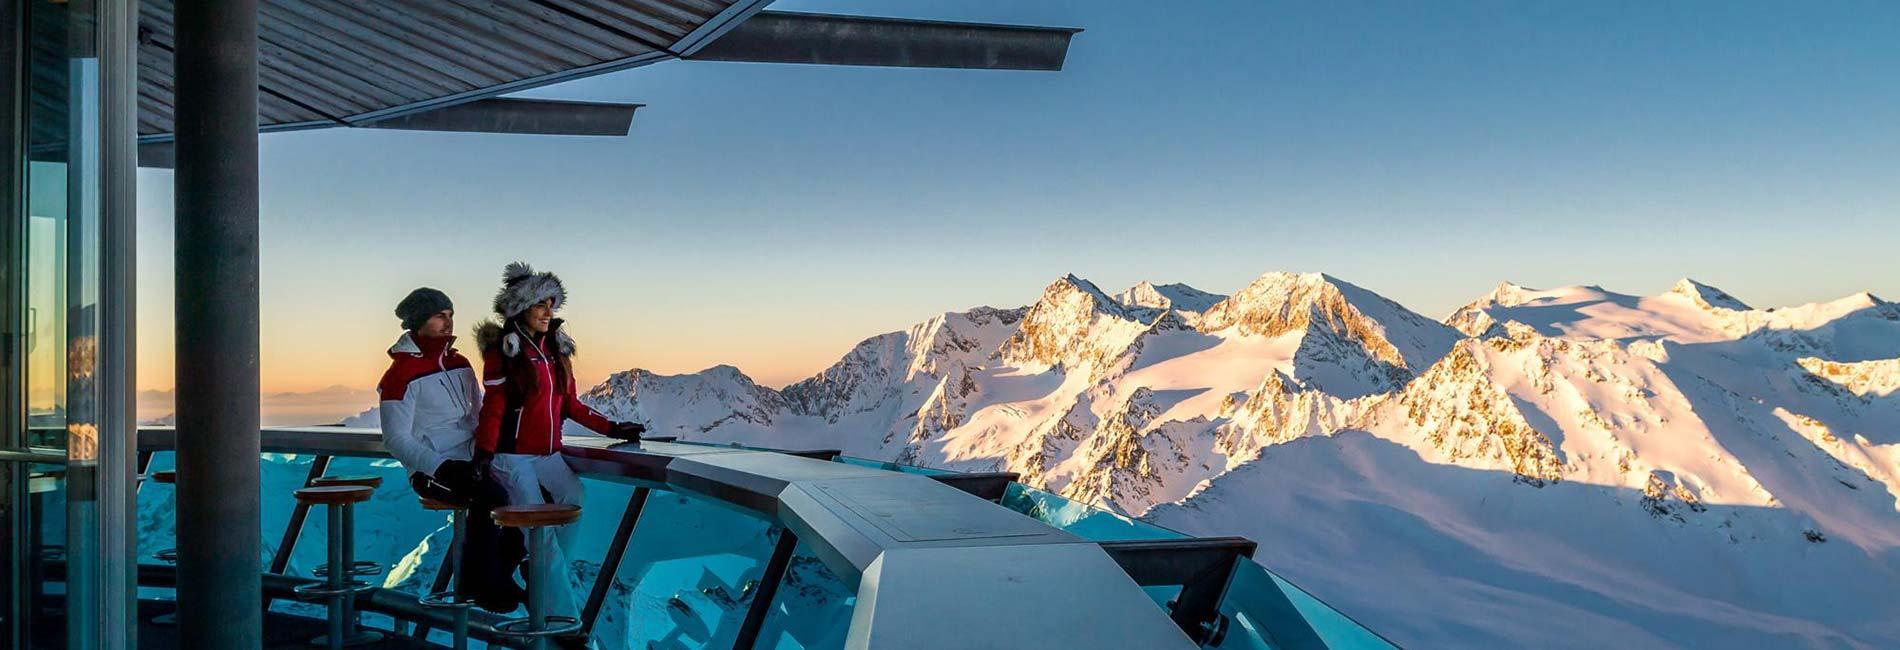 TOP Mountain Star Gastronomie im Skigebiet Obergurgl Hochgurgl Sölden